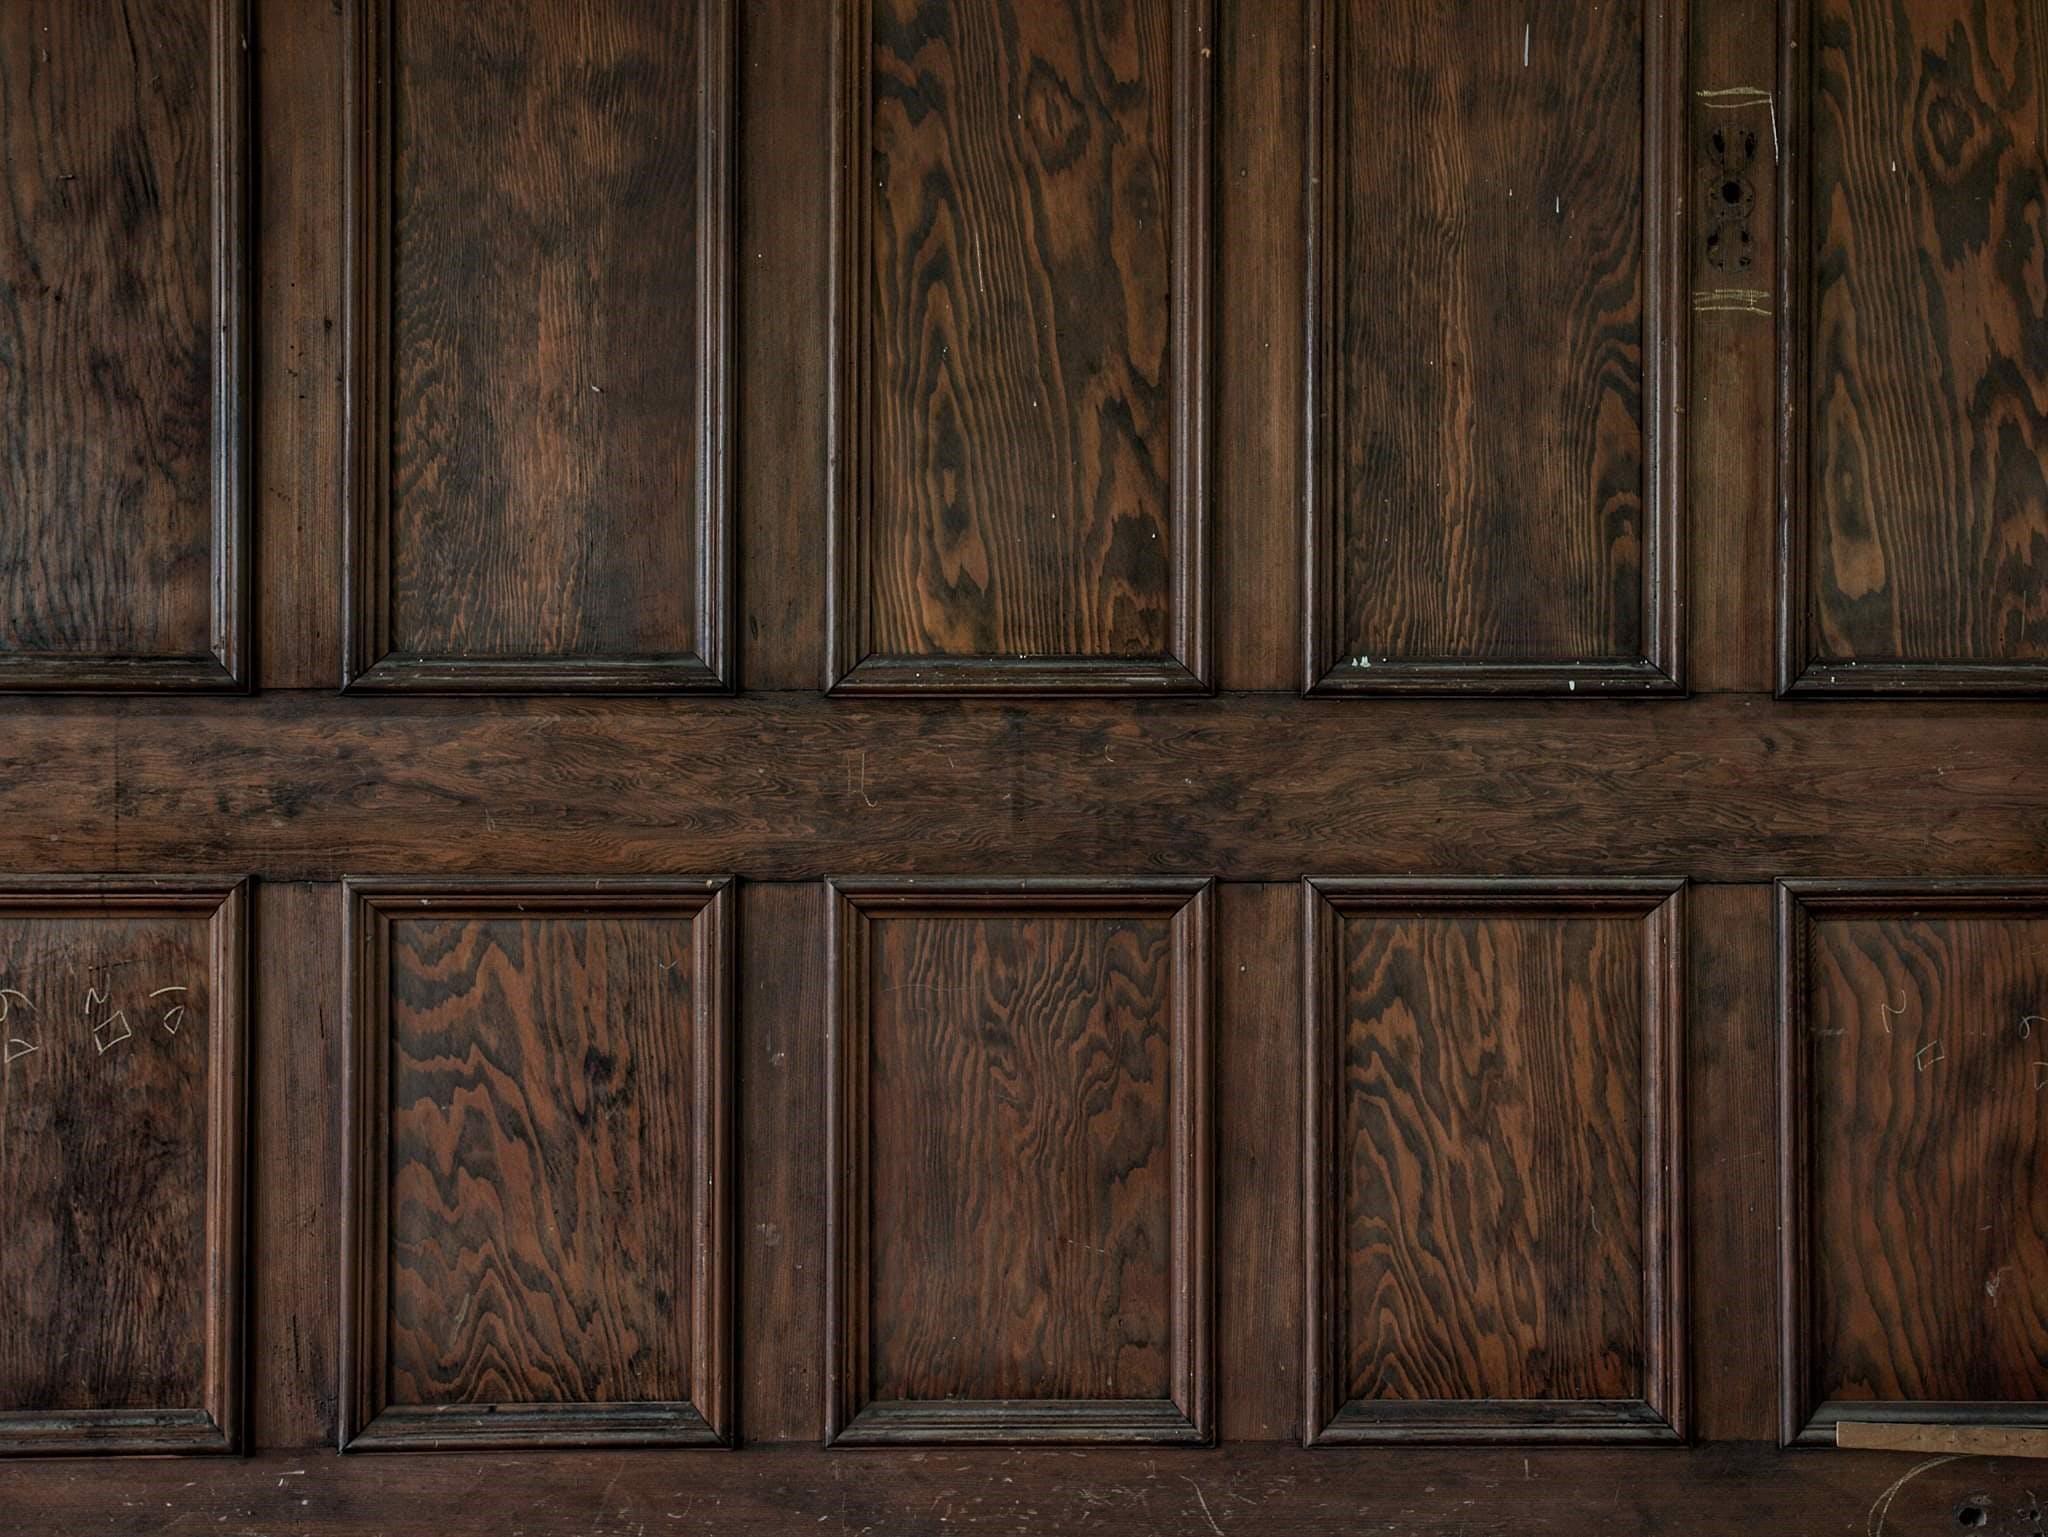 St Brigid's interior wood panelling